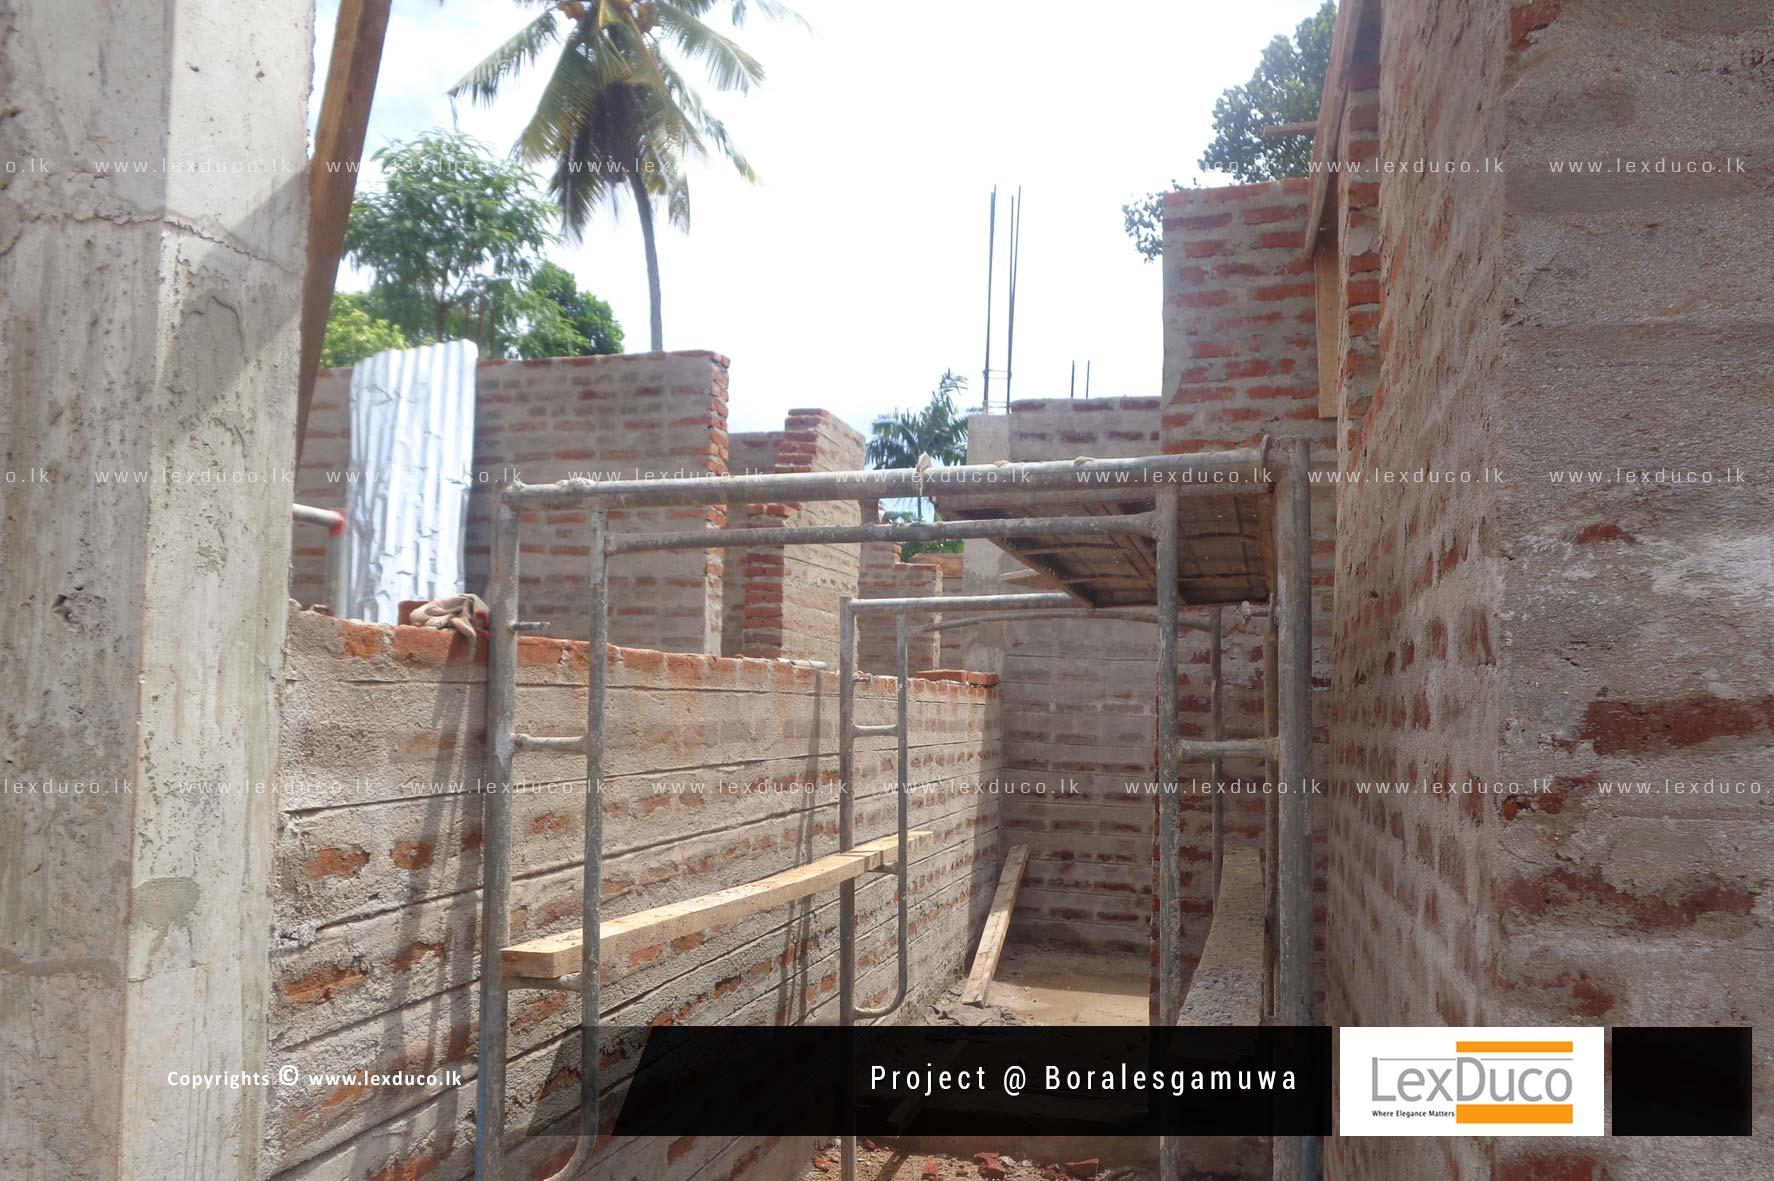 Residential Housing Project at Borelasgamuwa | Lex Duco